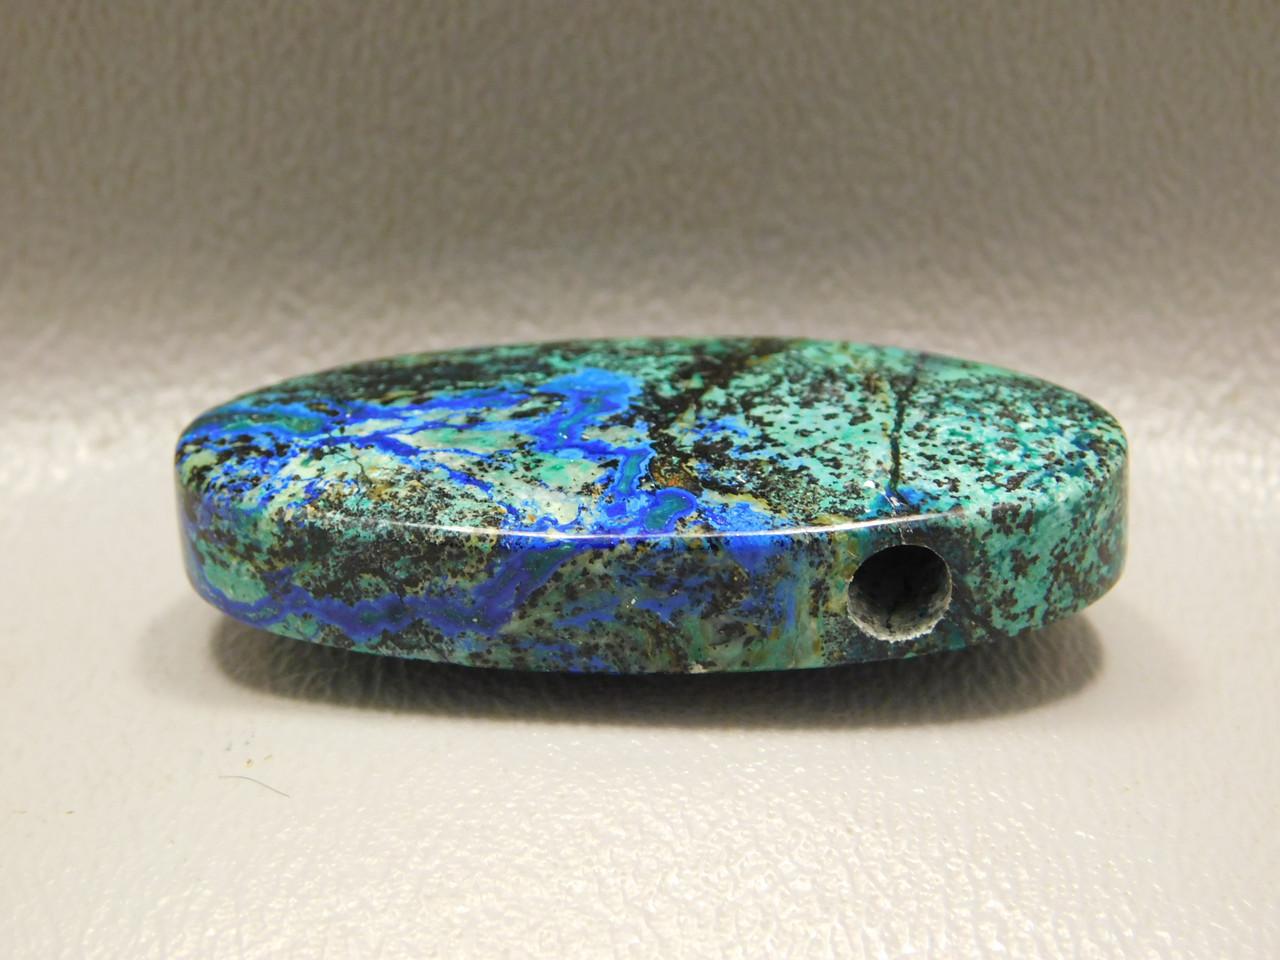 Azurite Malachite Stone Bead Pendant #11